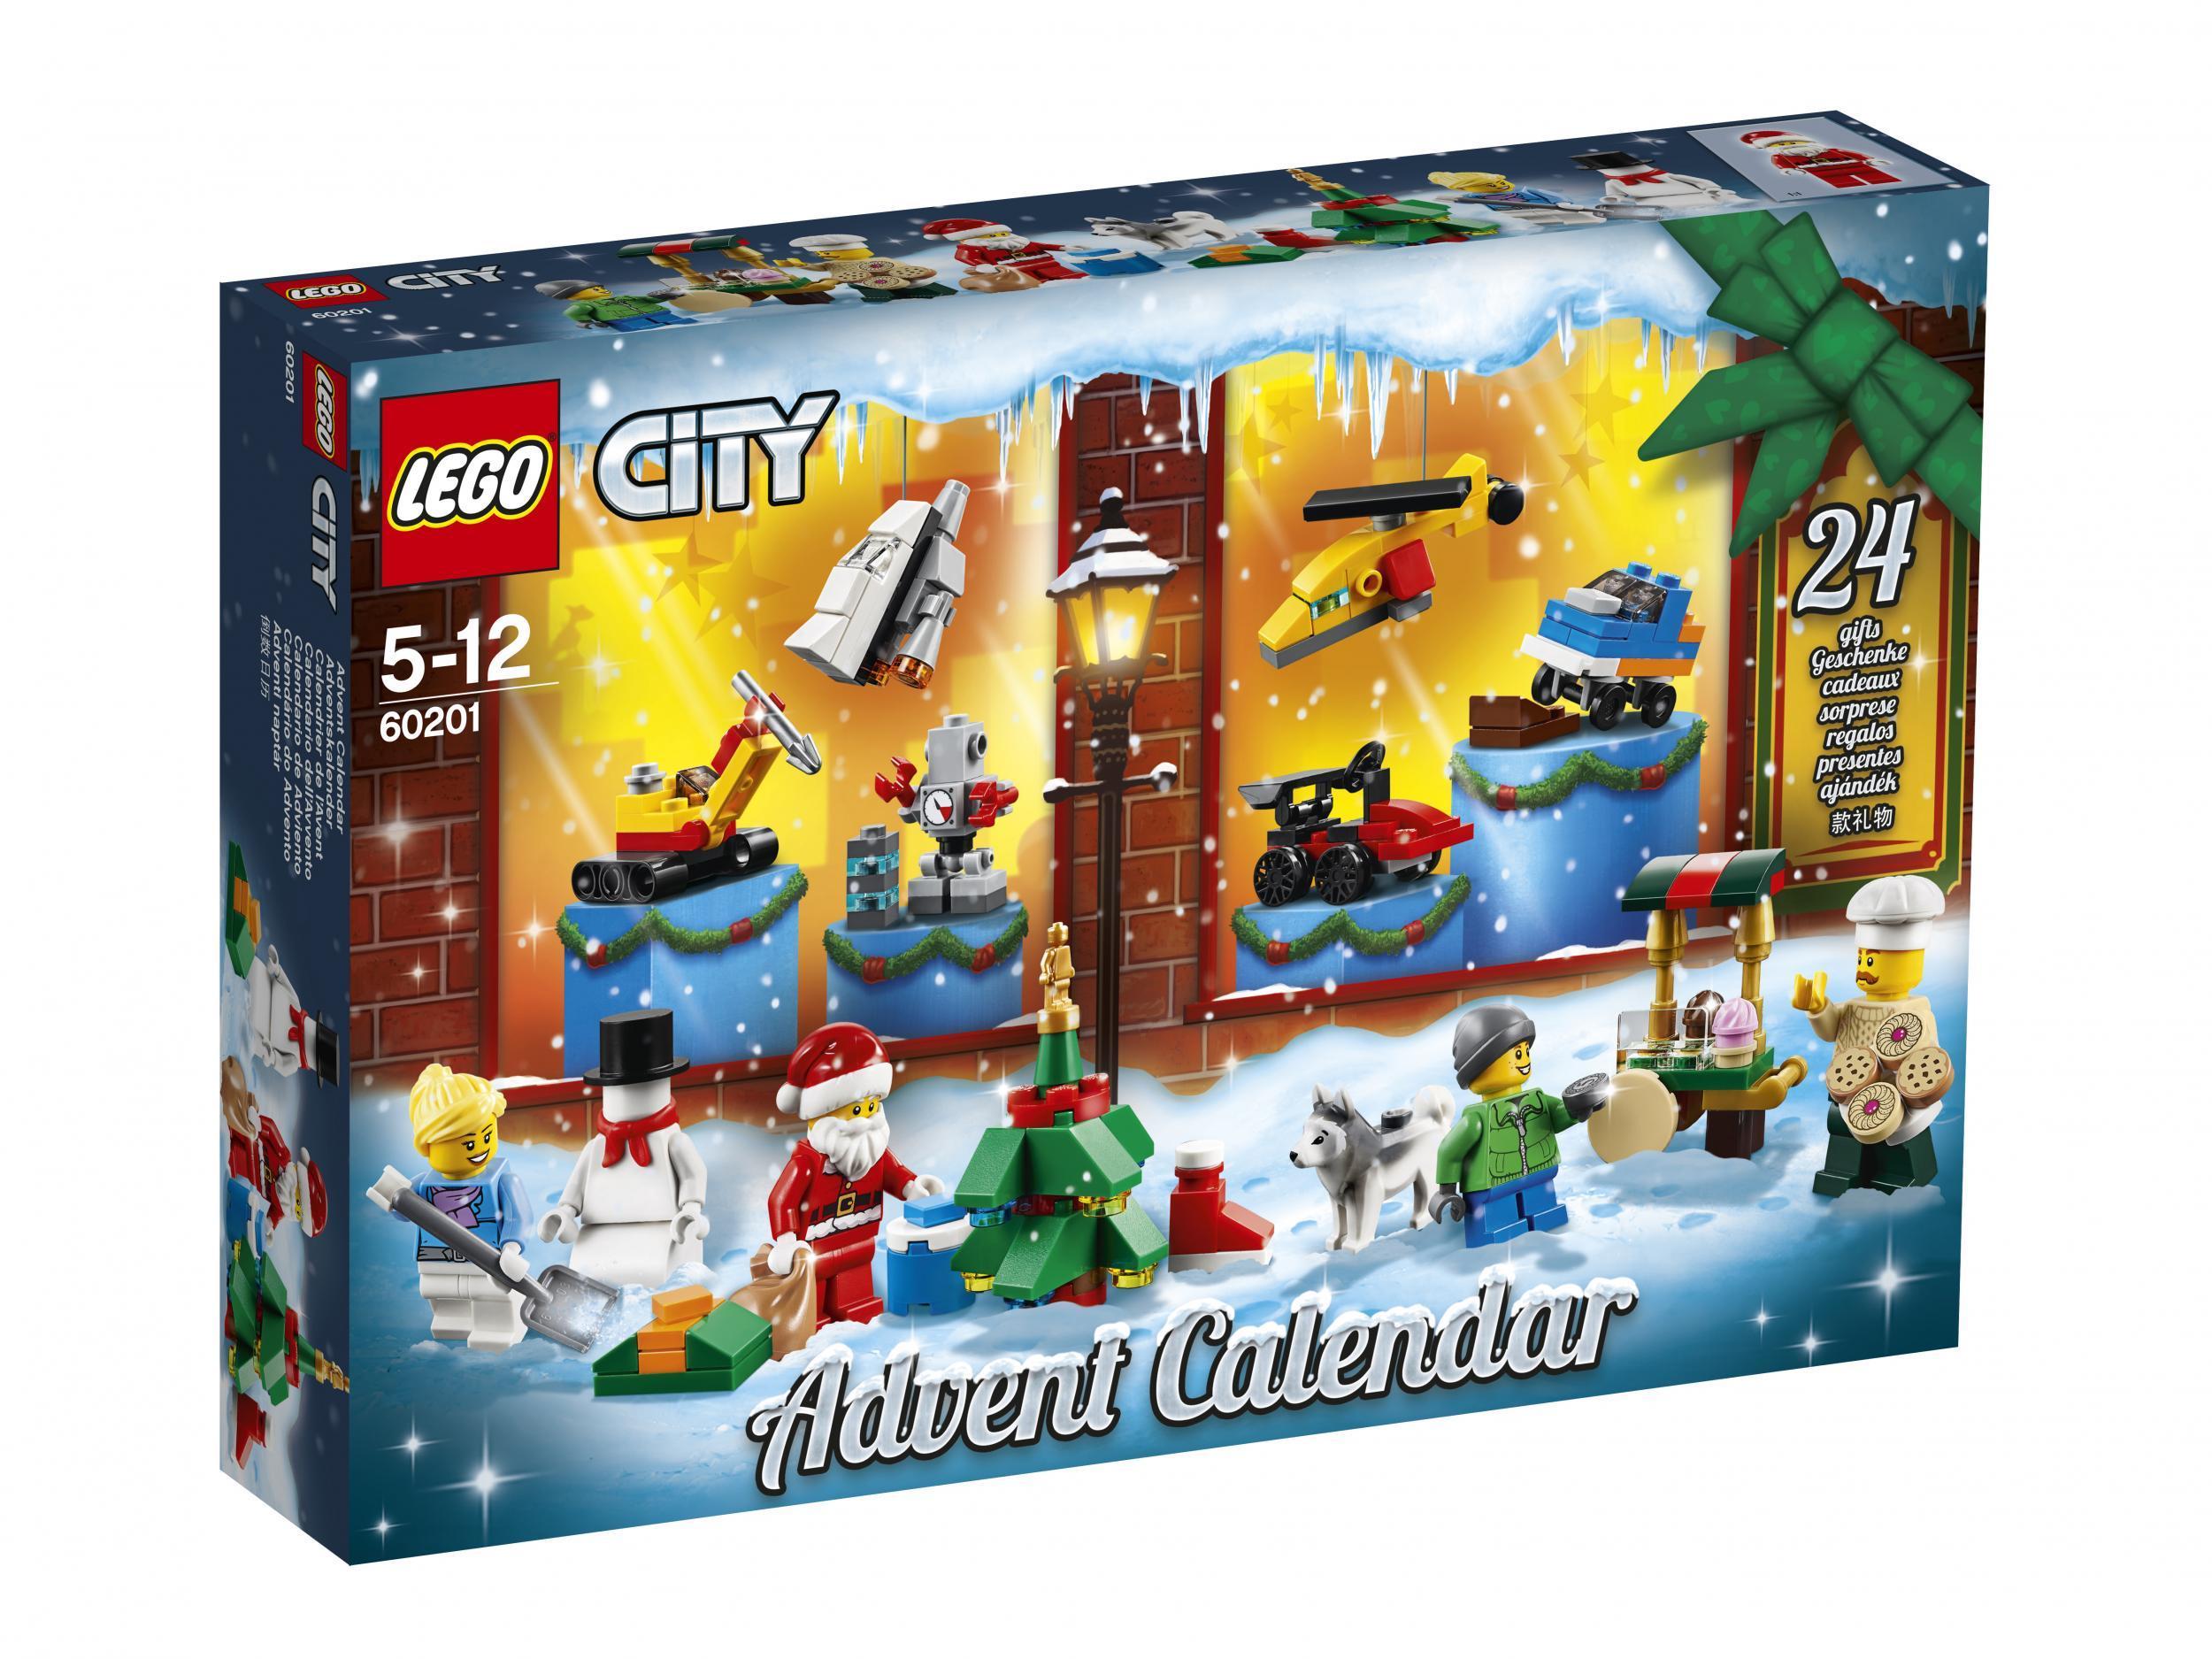 Fun Fit Calendario.15 Best Kids Advent Calendars For Christmas 2018 The